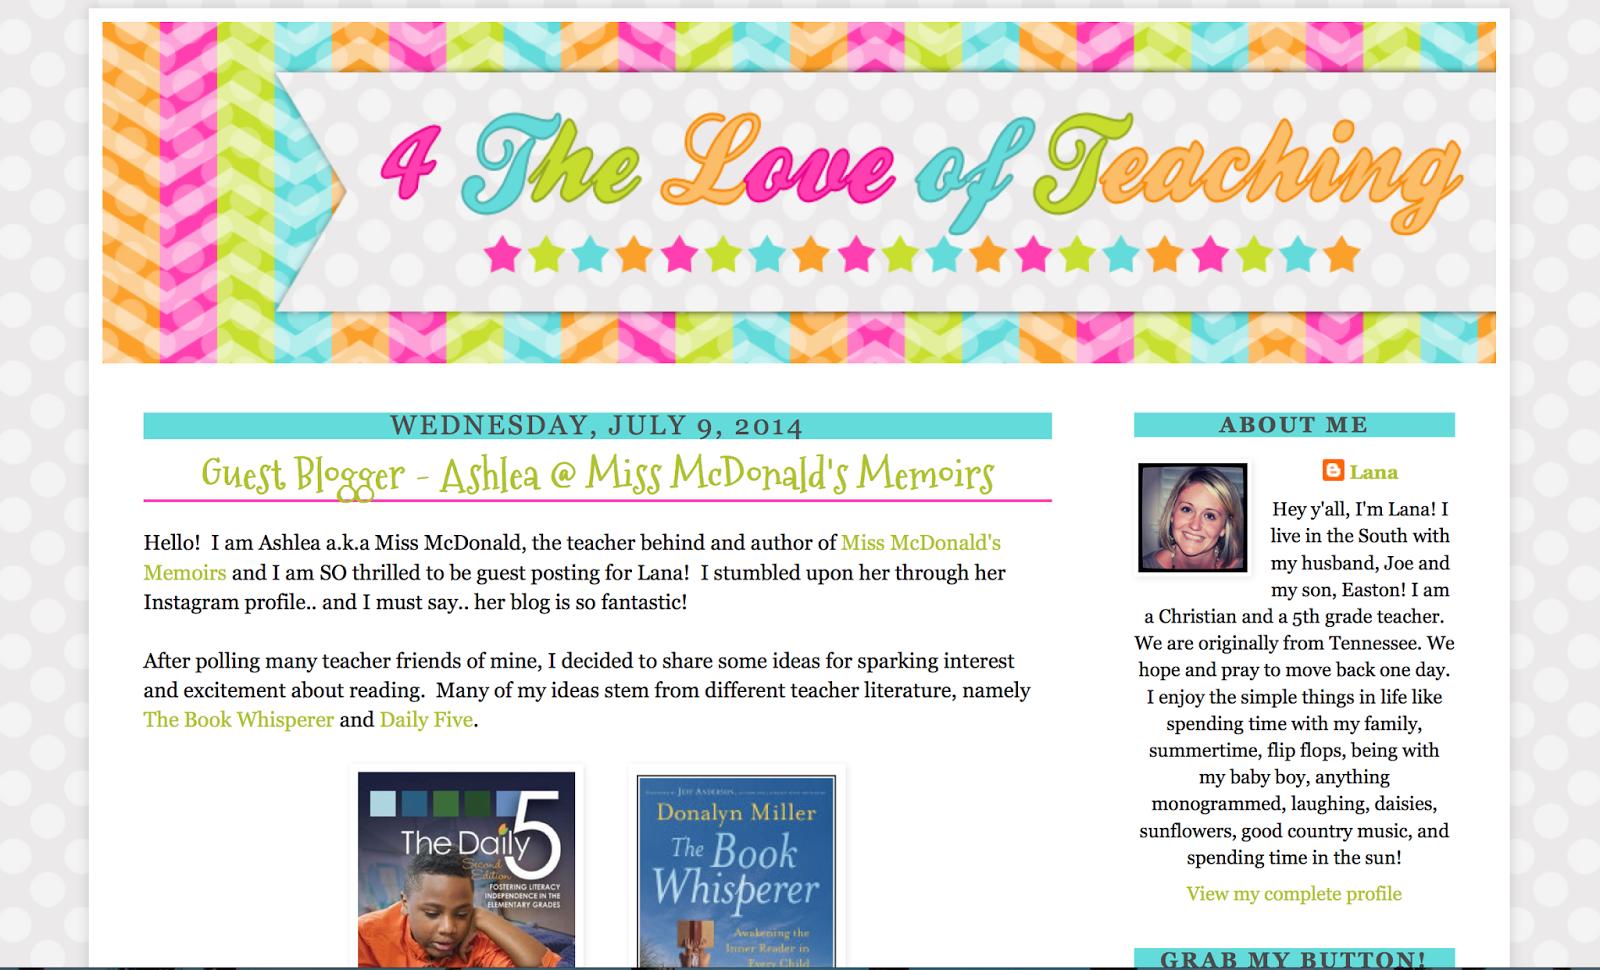 http://4theloveofteaching.blogspot.com/2014/07/guest-blogger-ashlea-miss-mcdonalds.html